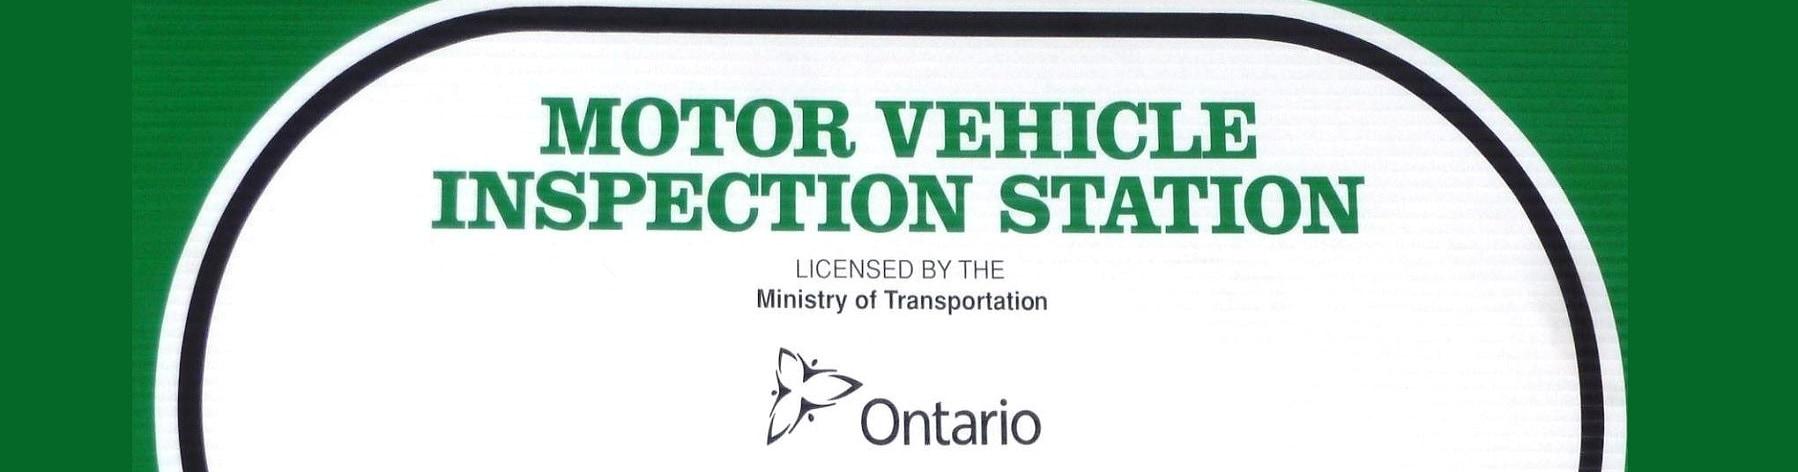 Mto Motor Vehicle Inspection Station Toronto Mississauga Brampton